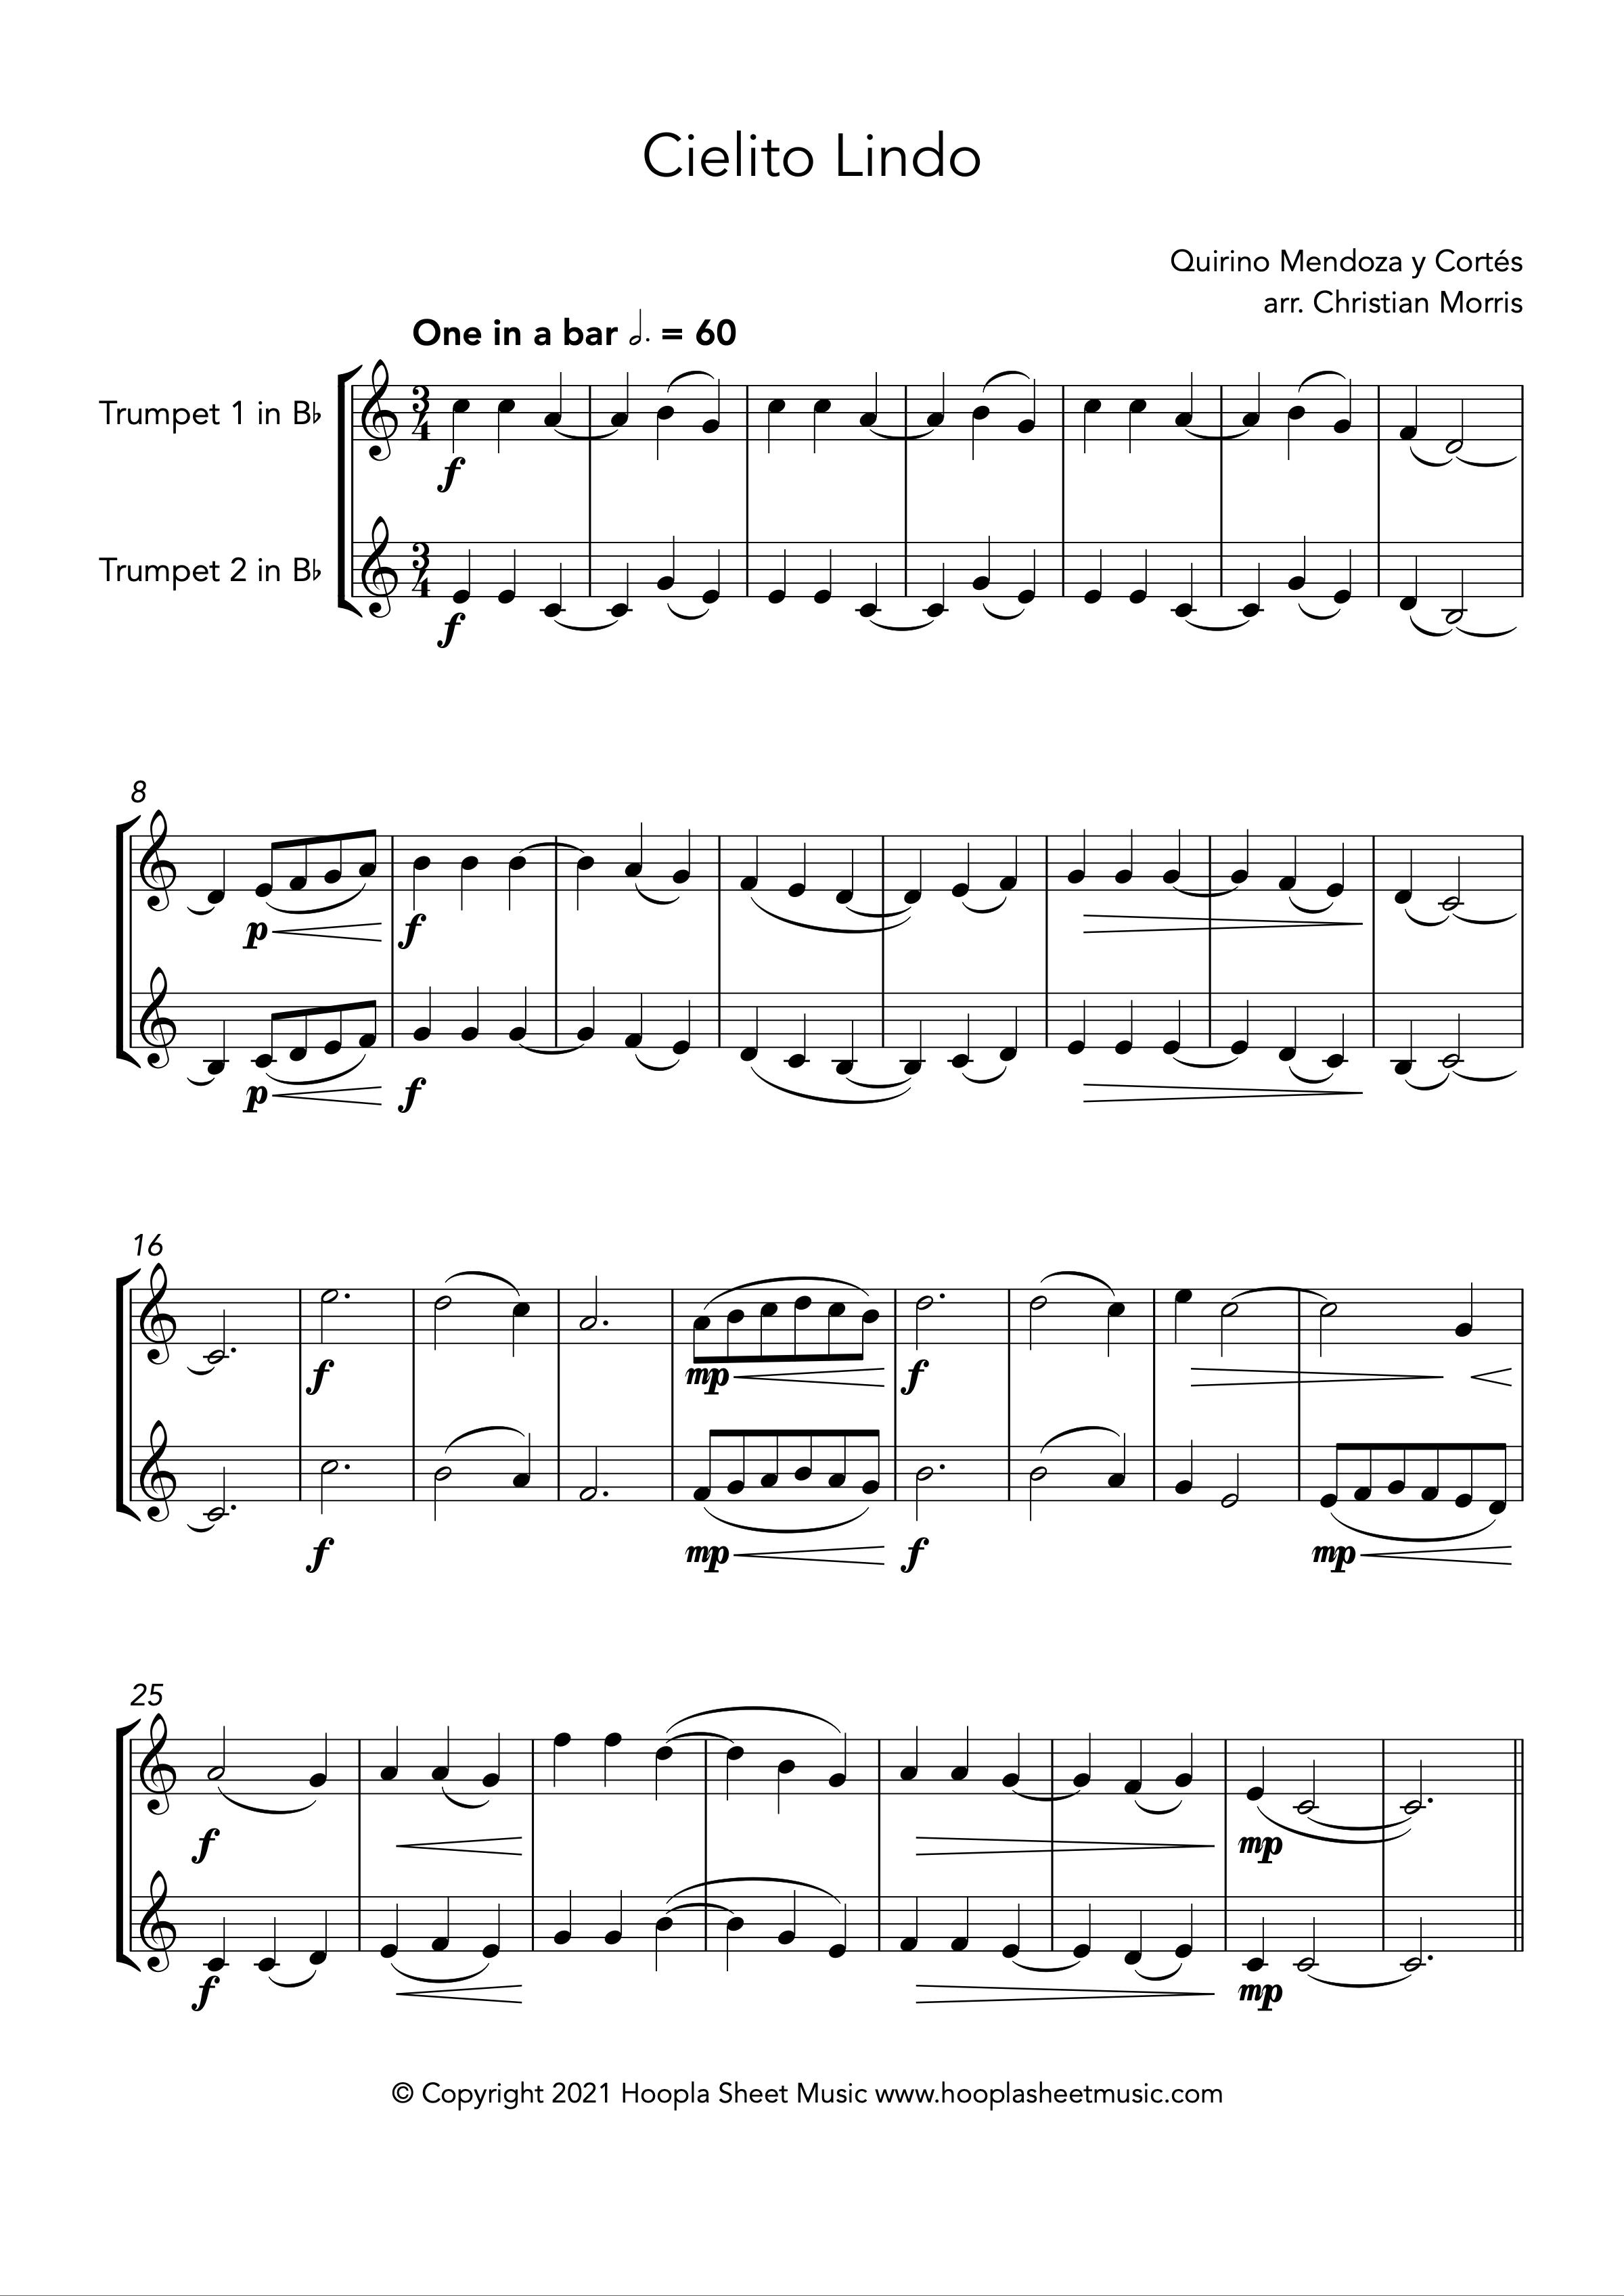 Cielito Lindo (Trumpet Duet)